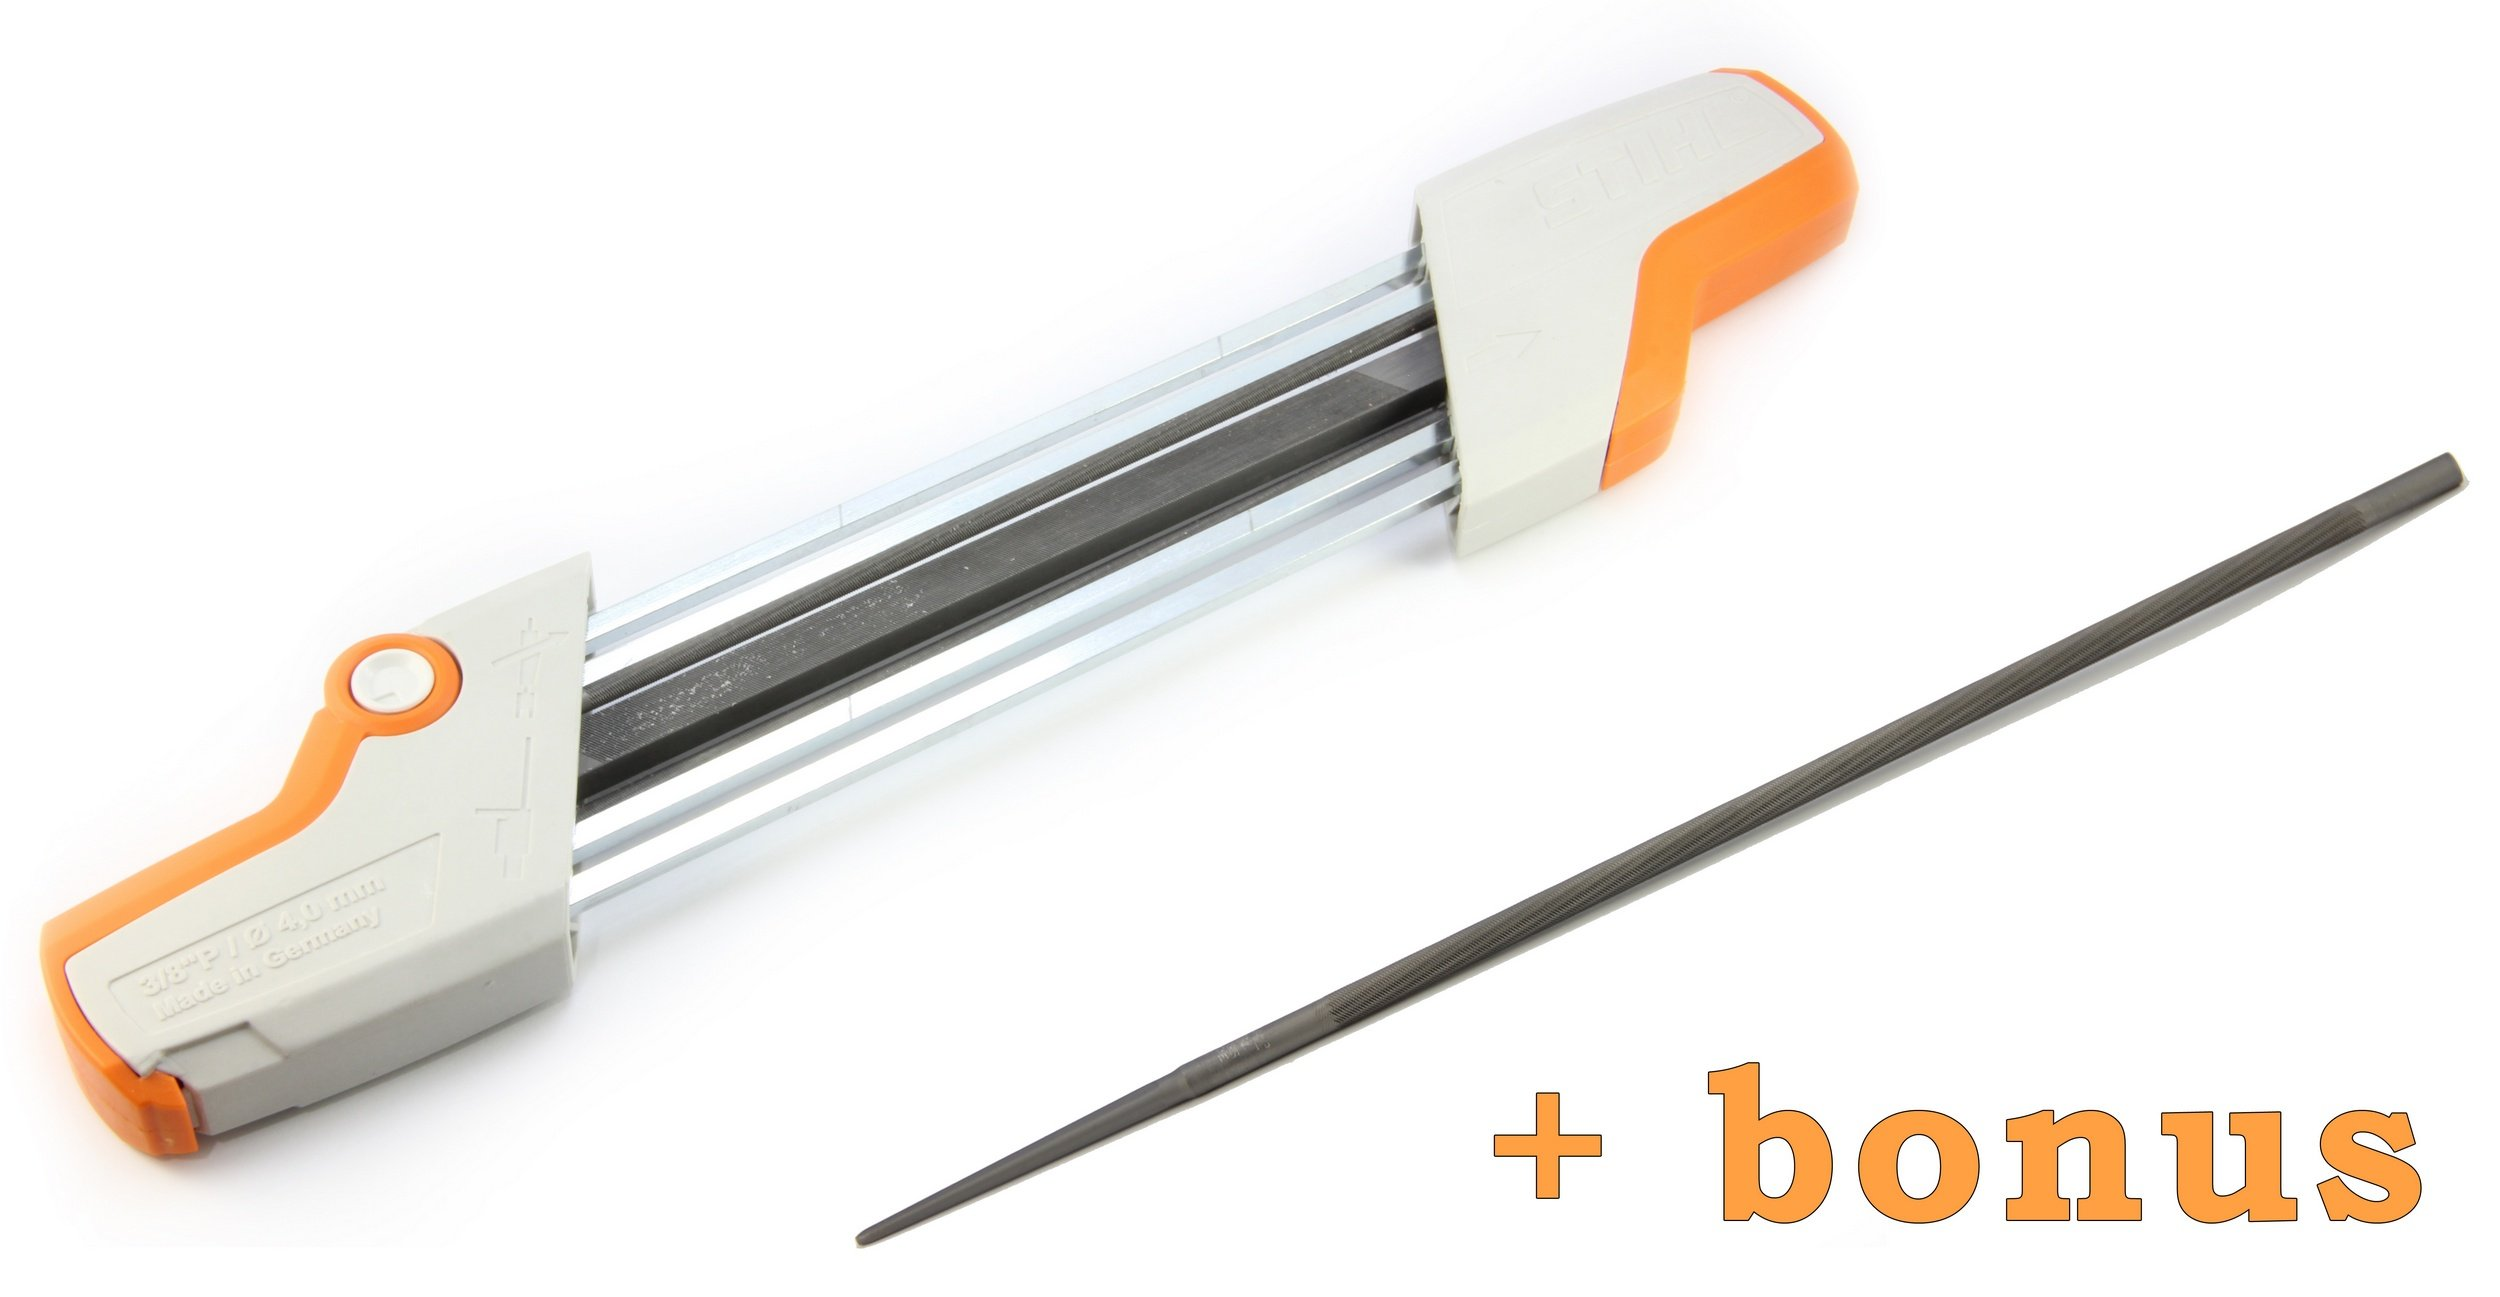 Stihl 2 in 1 Easy File Chainsaw Chain Sharpener 3/8 P + Bonus Replacement File! by Stihl